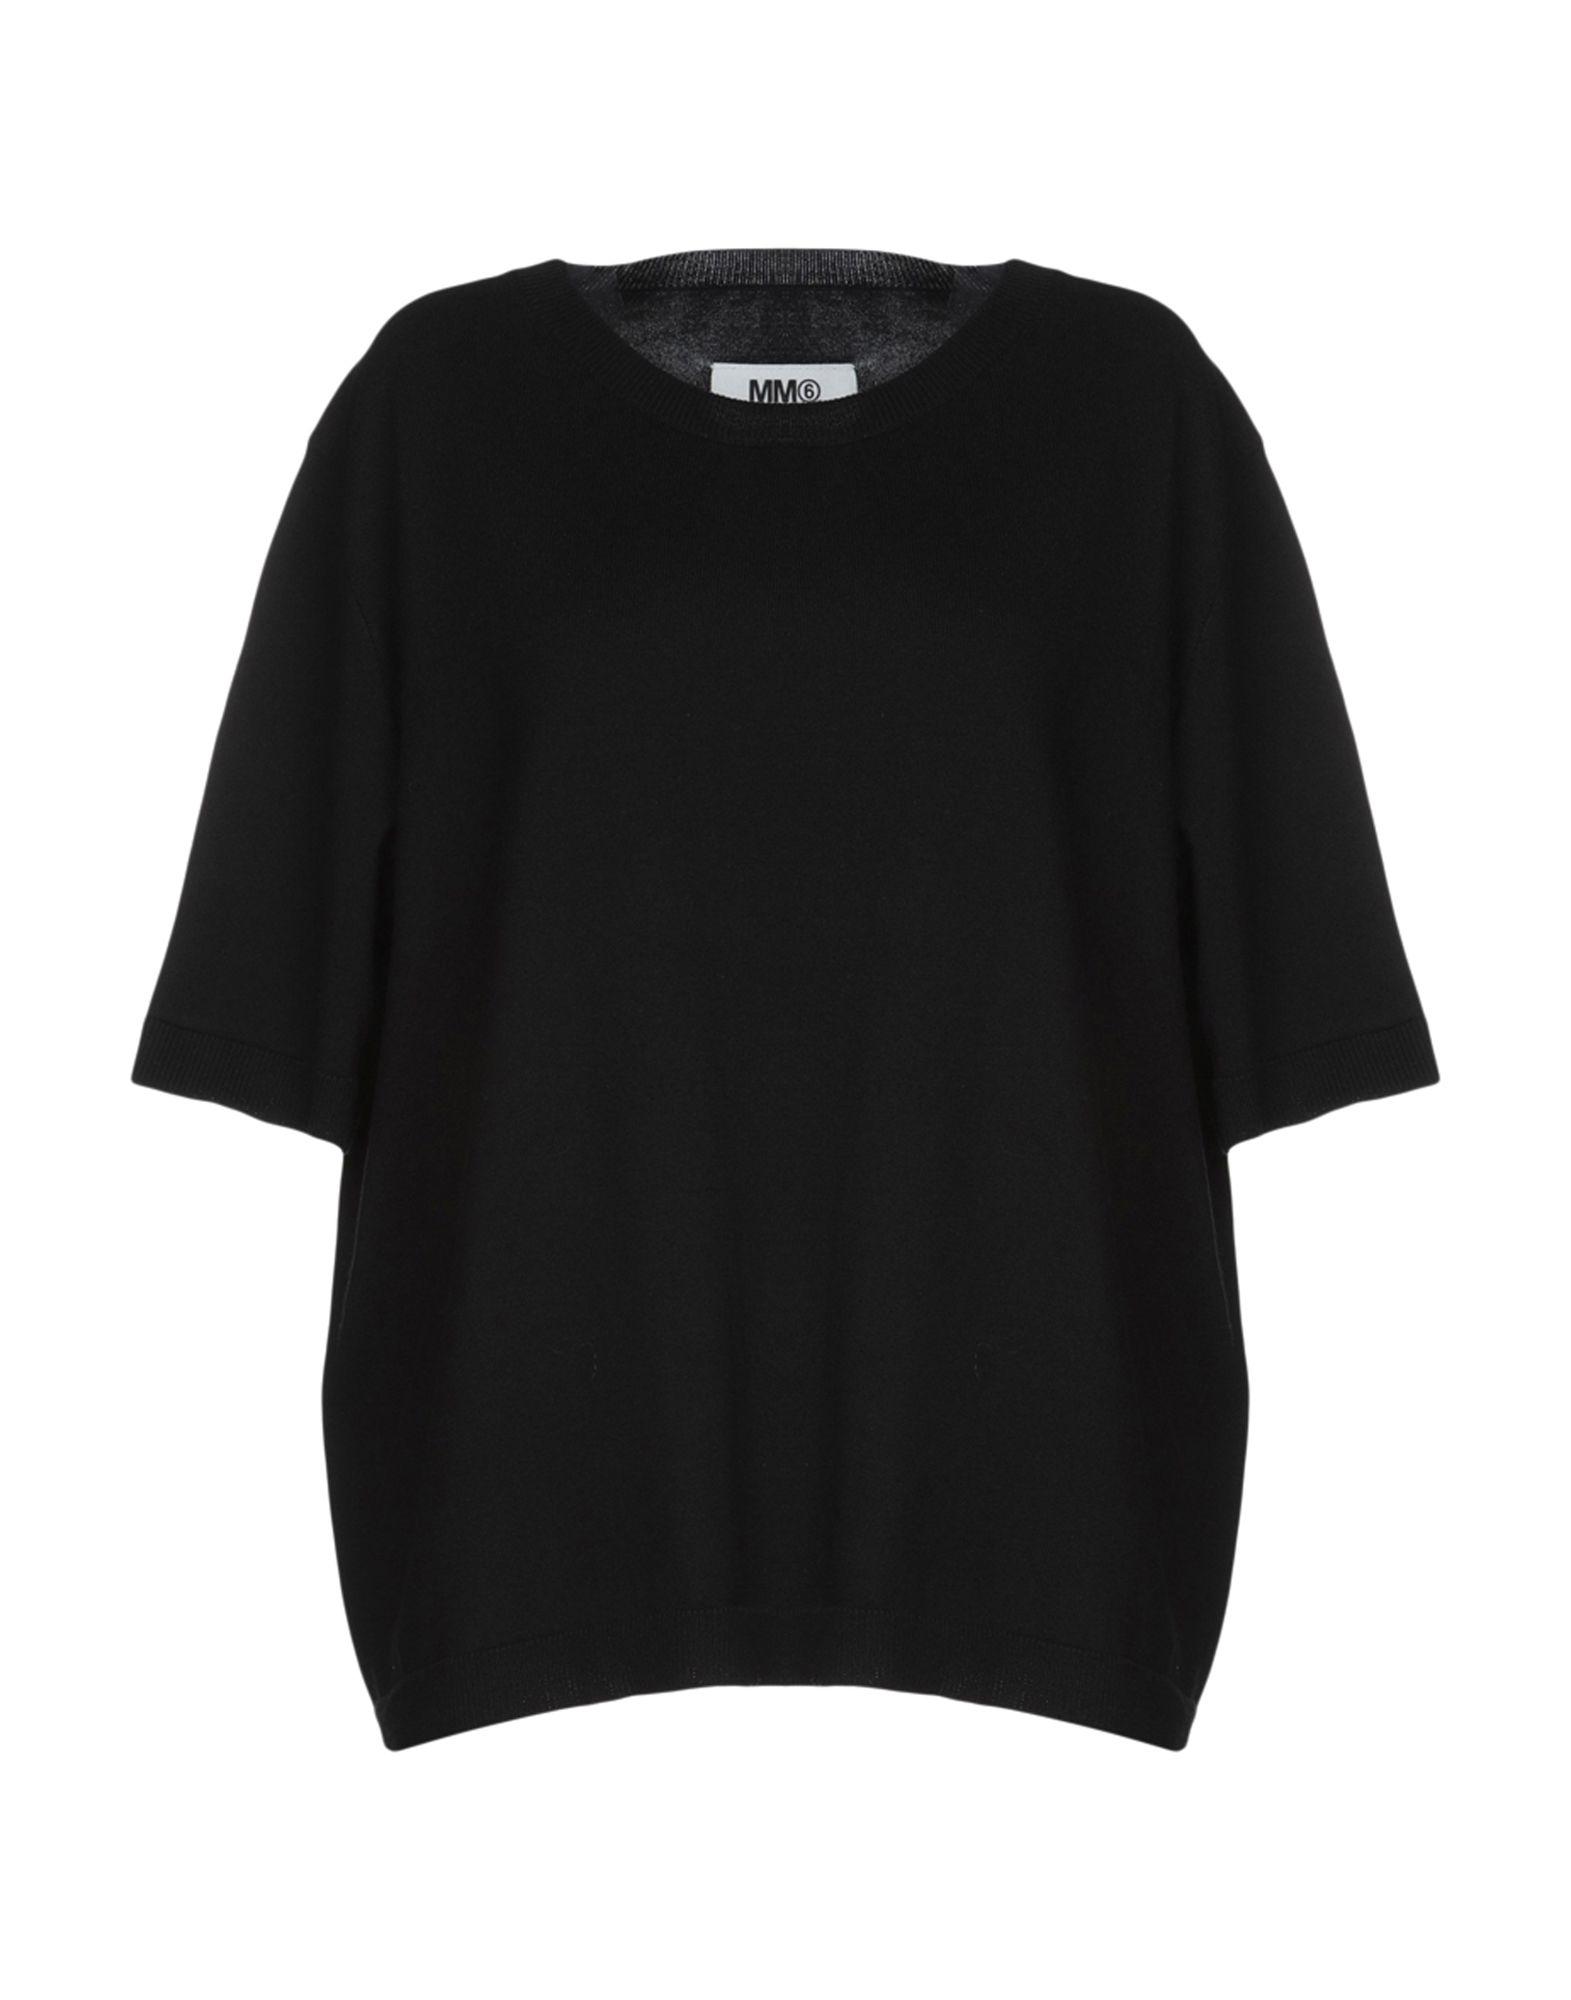 MM6 MAISON MARGIELA Свитер mm6 maison margiela свитер